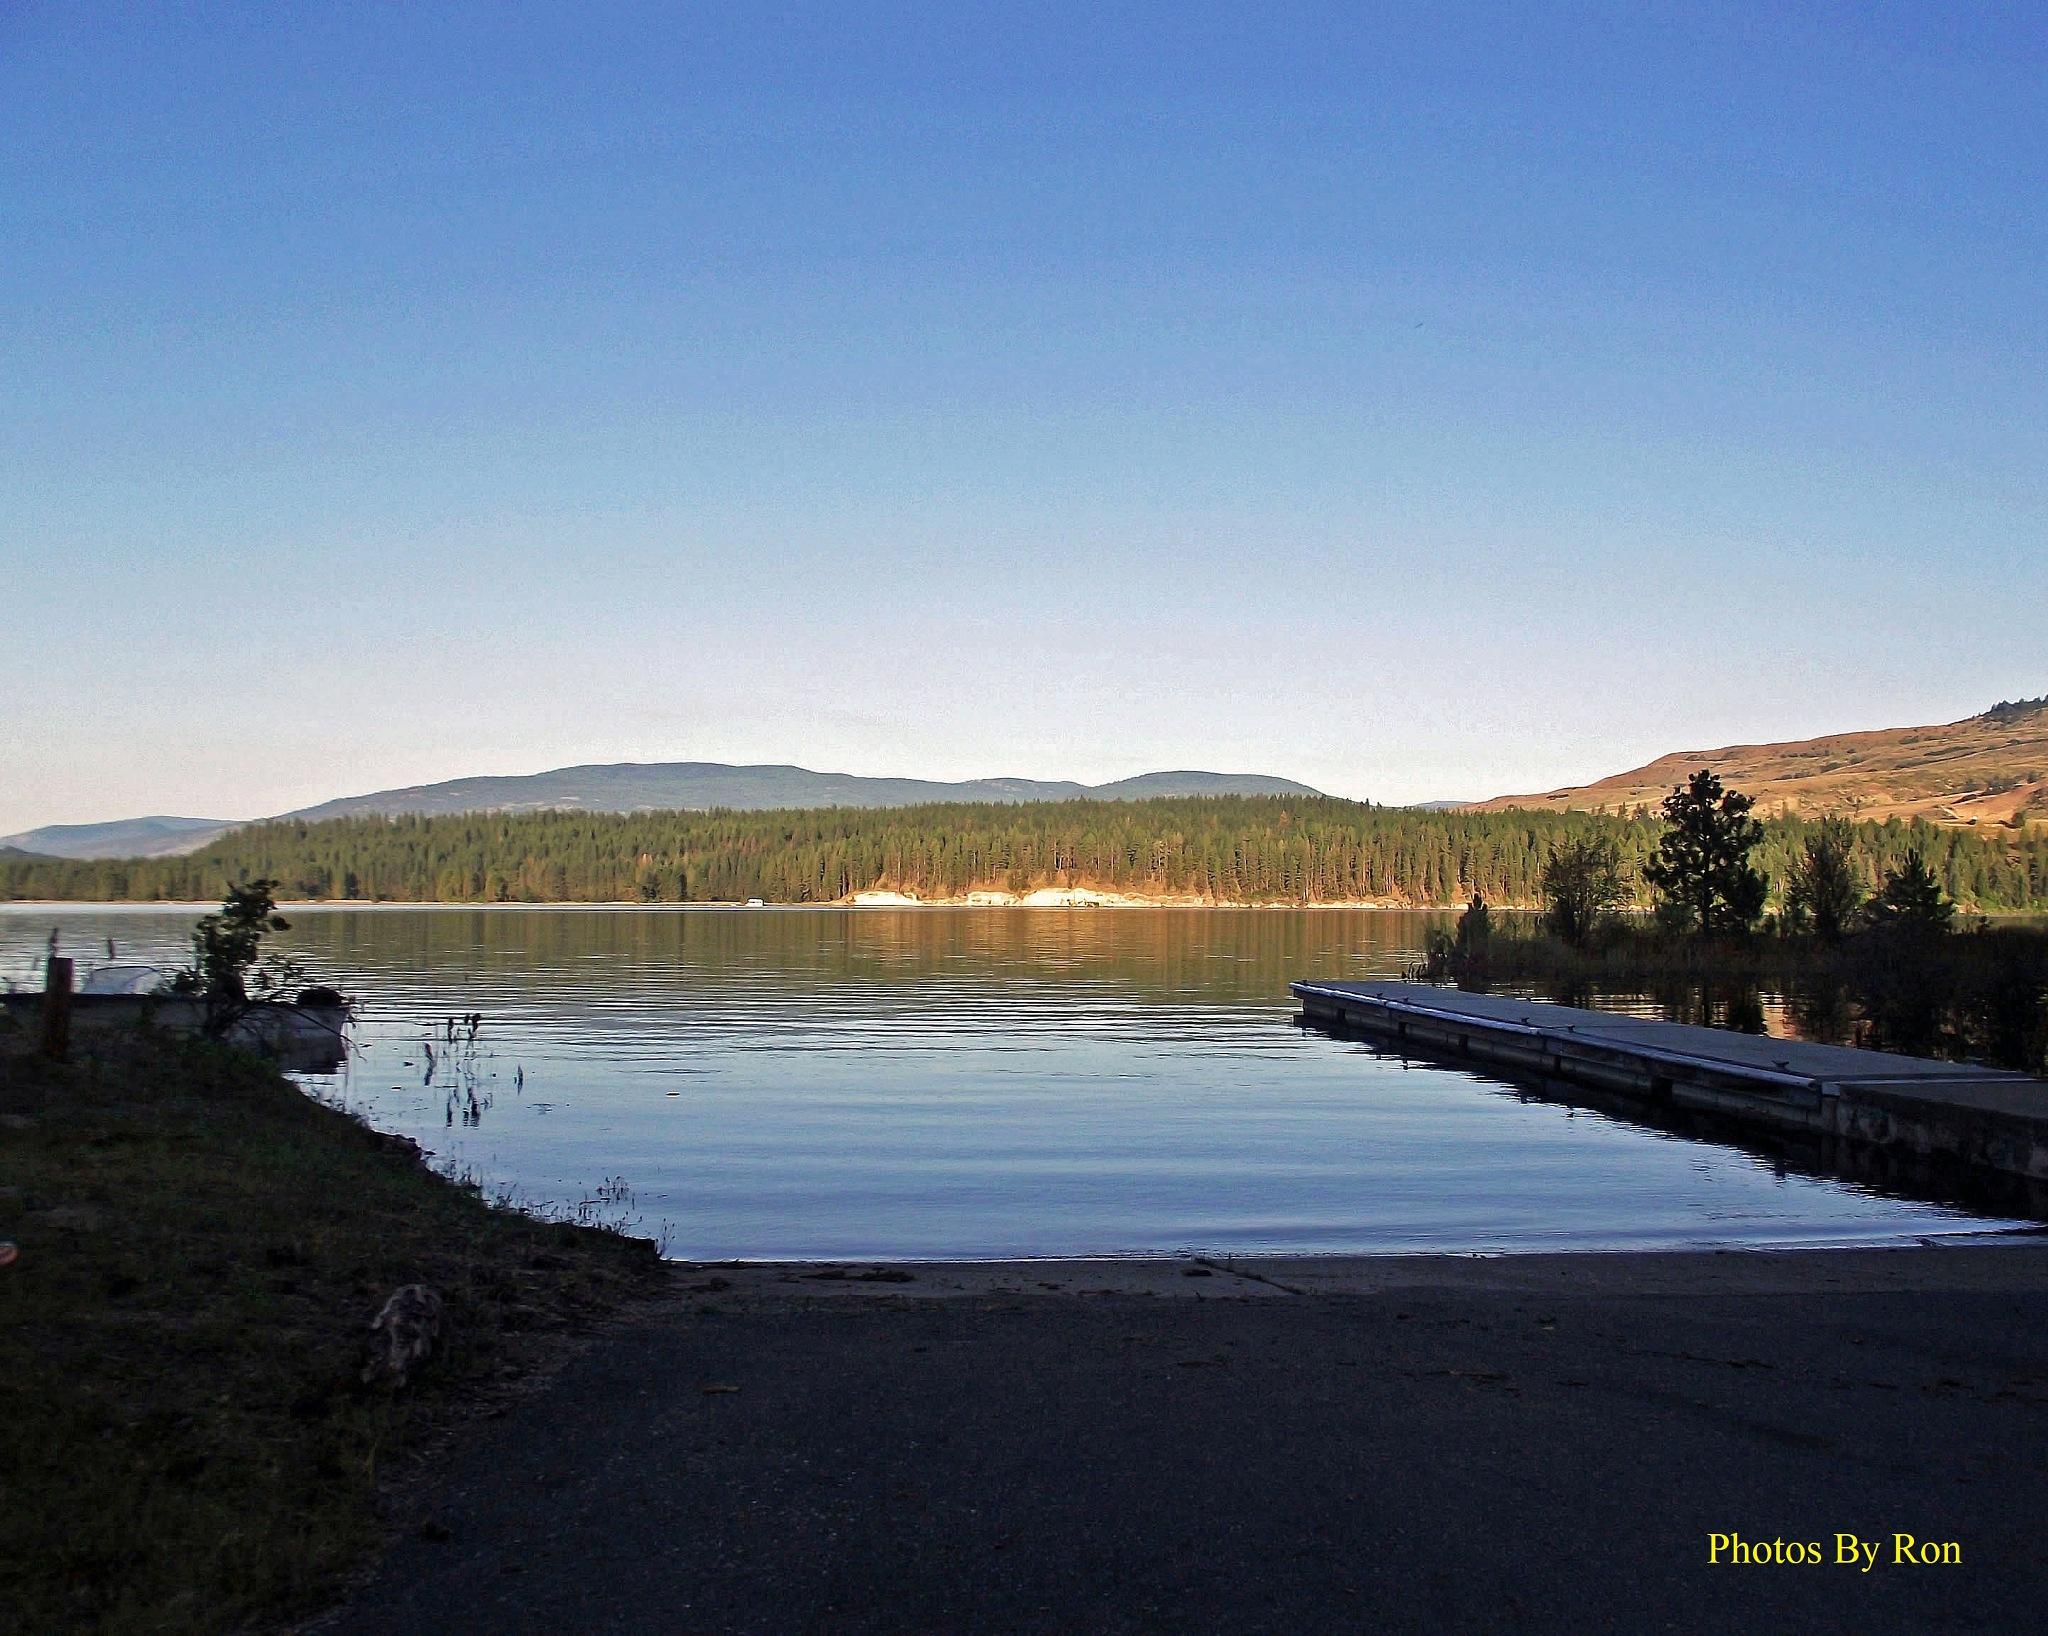 """Boat Ramp At Sunrise"" by Ron Berkley"